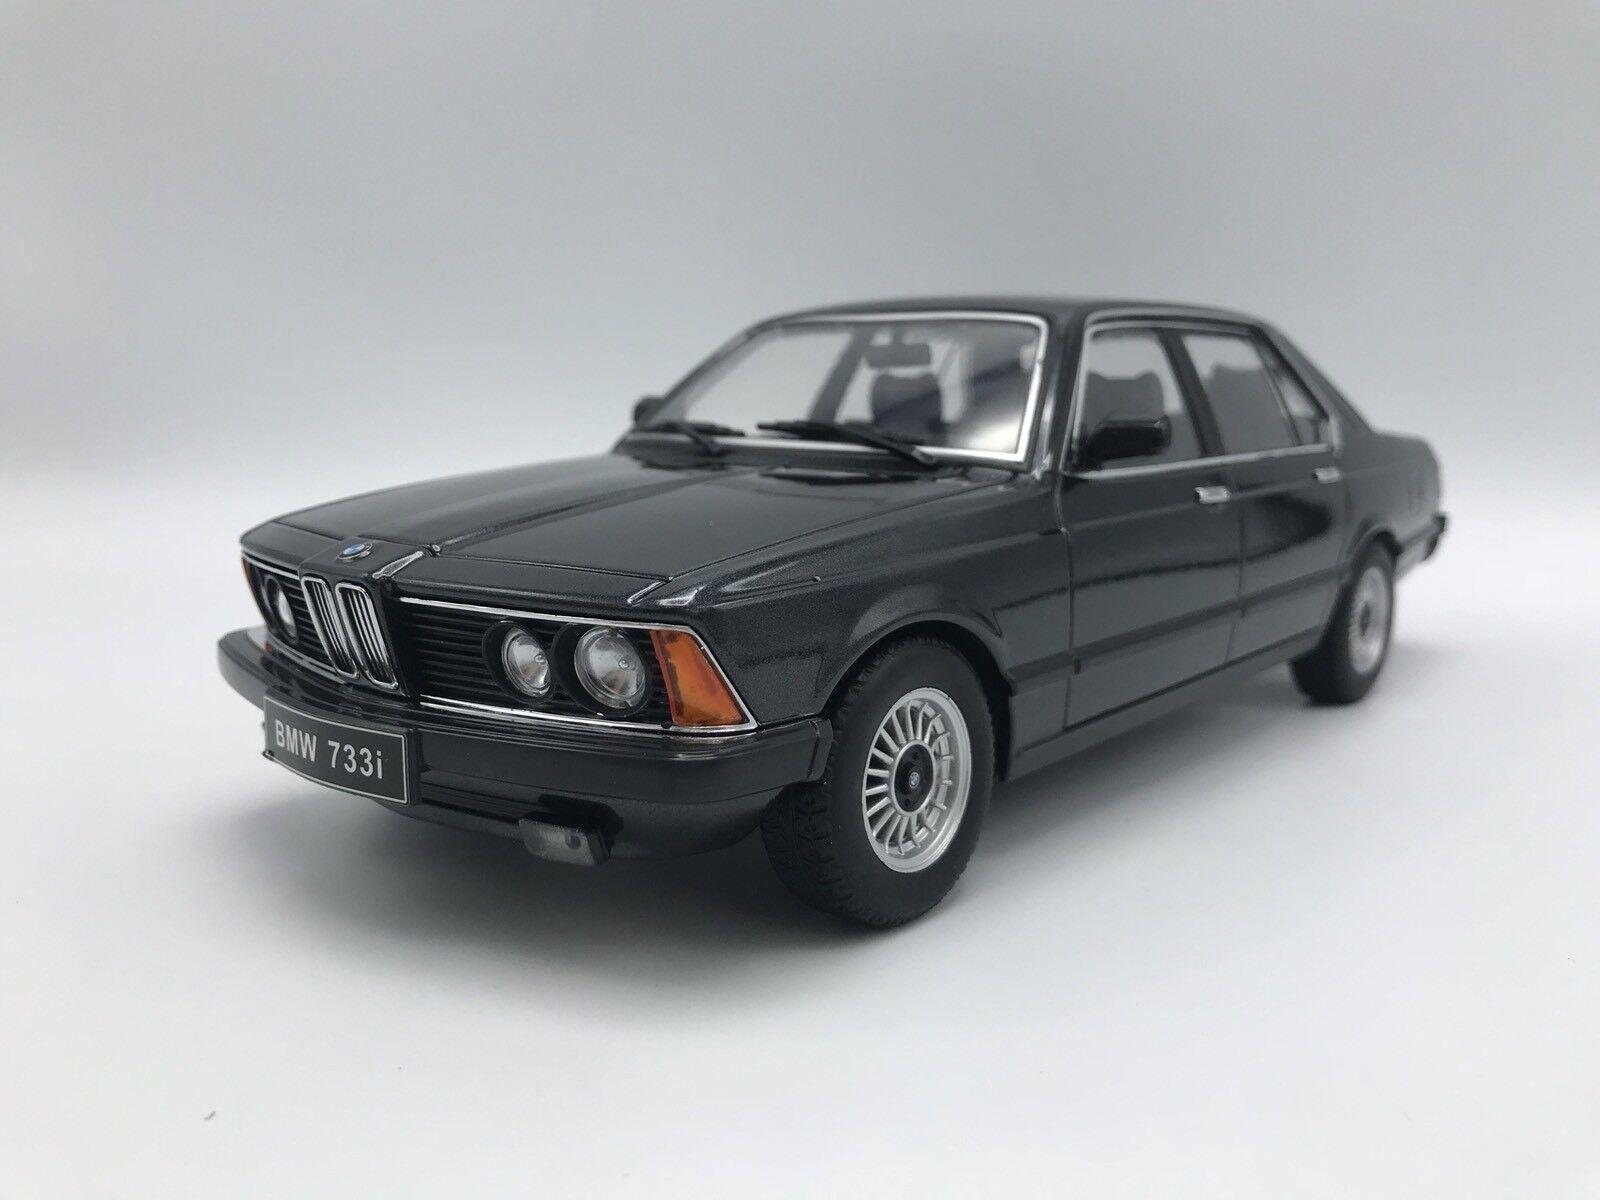 BMW 733i (E23) 1977 - metallic-black - 1 18 KK-Scale